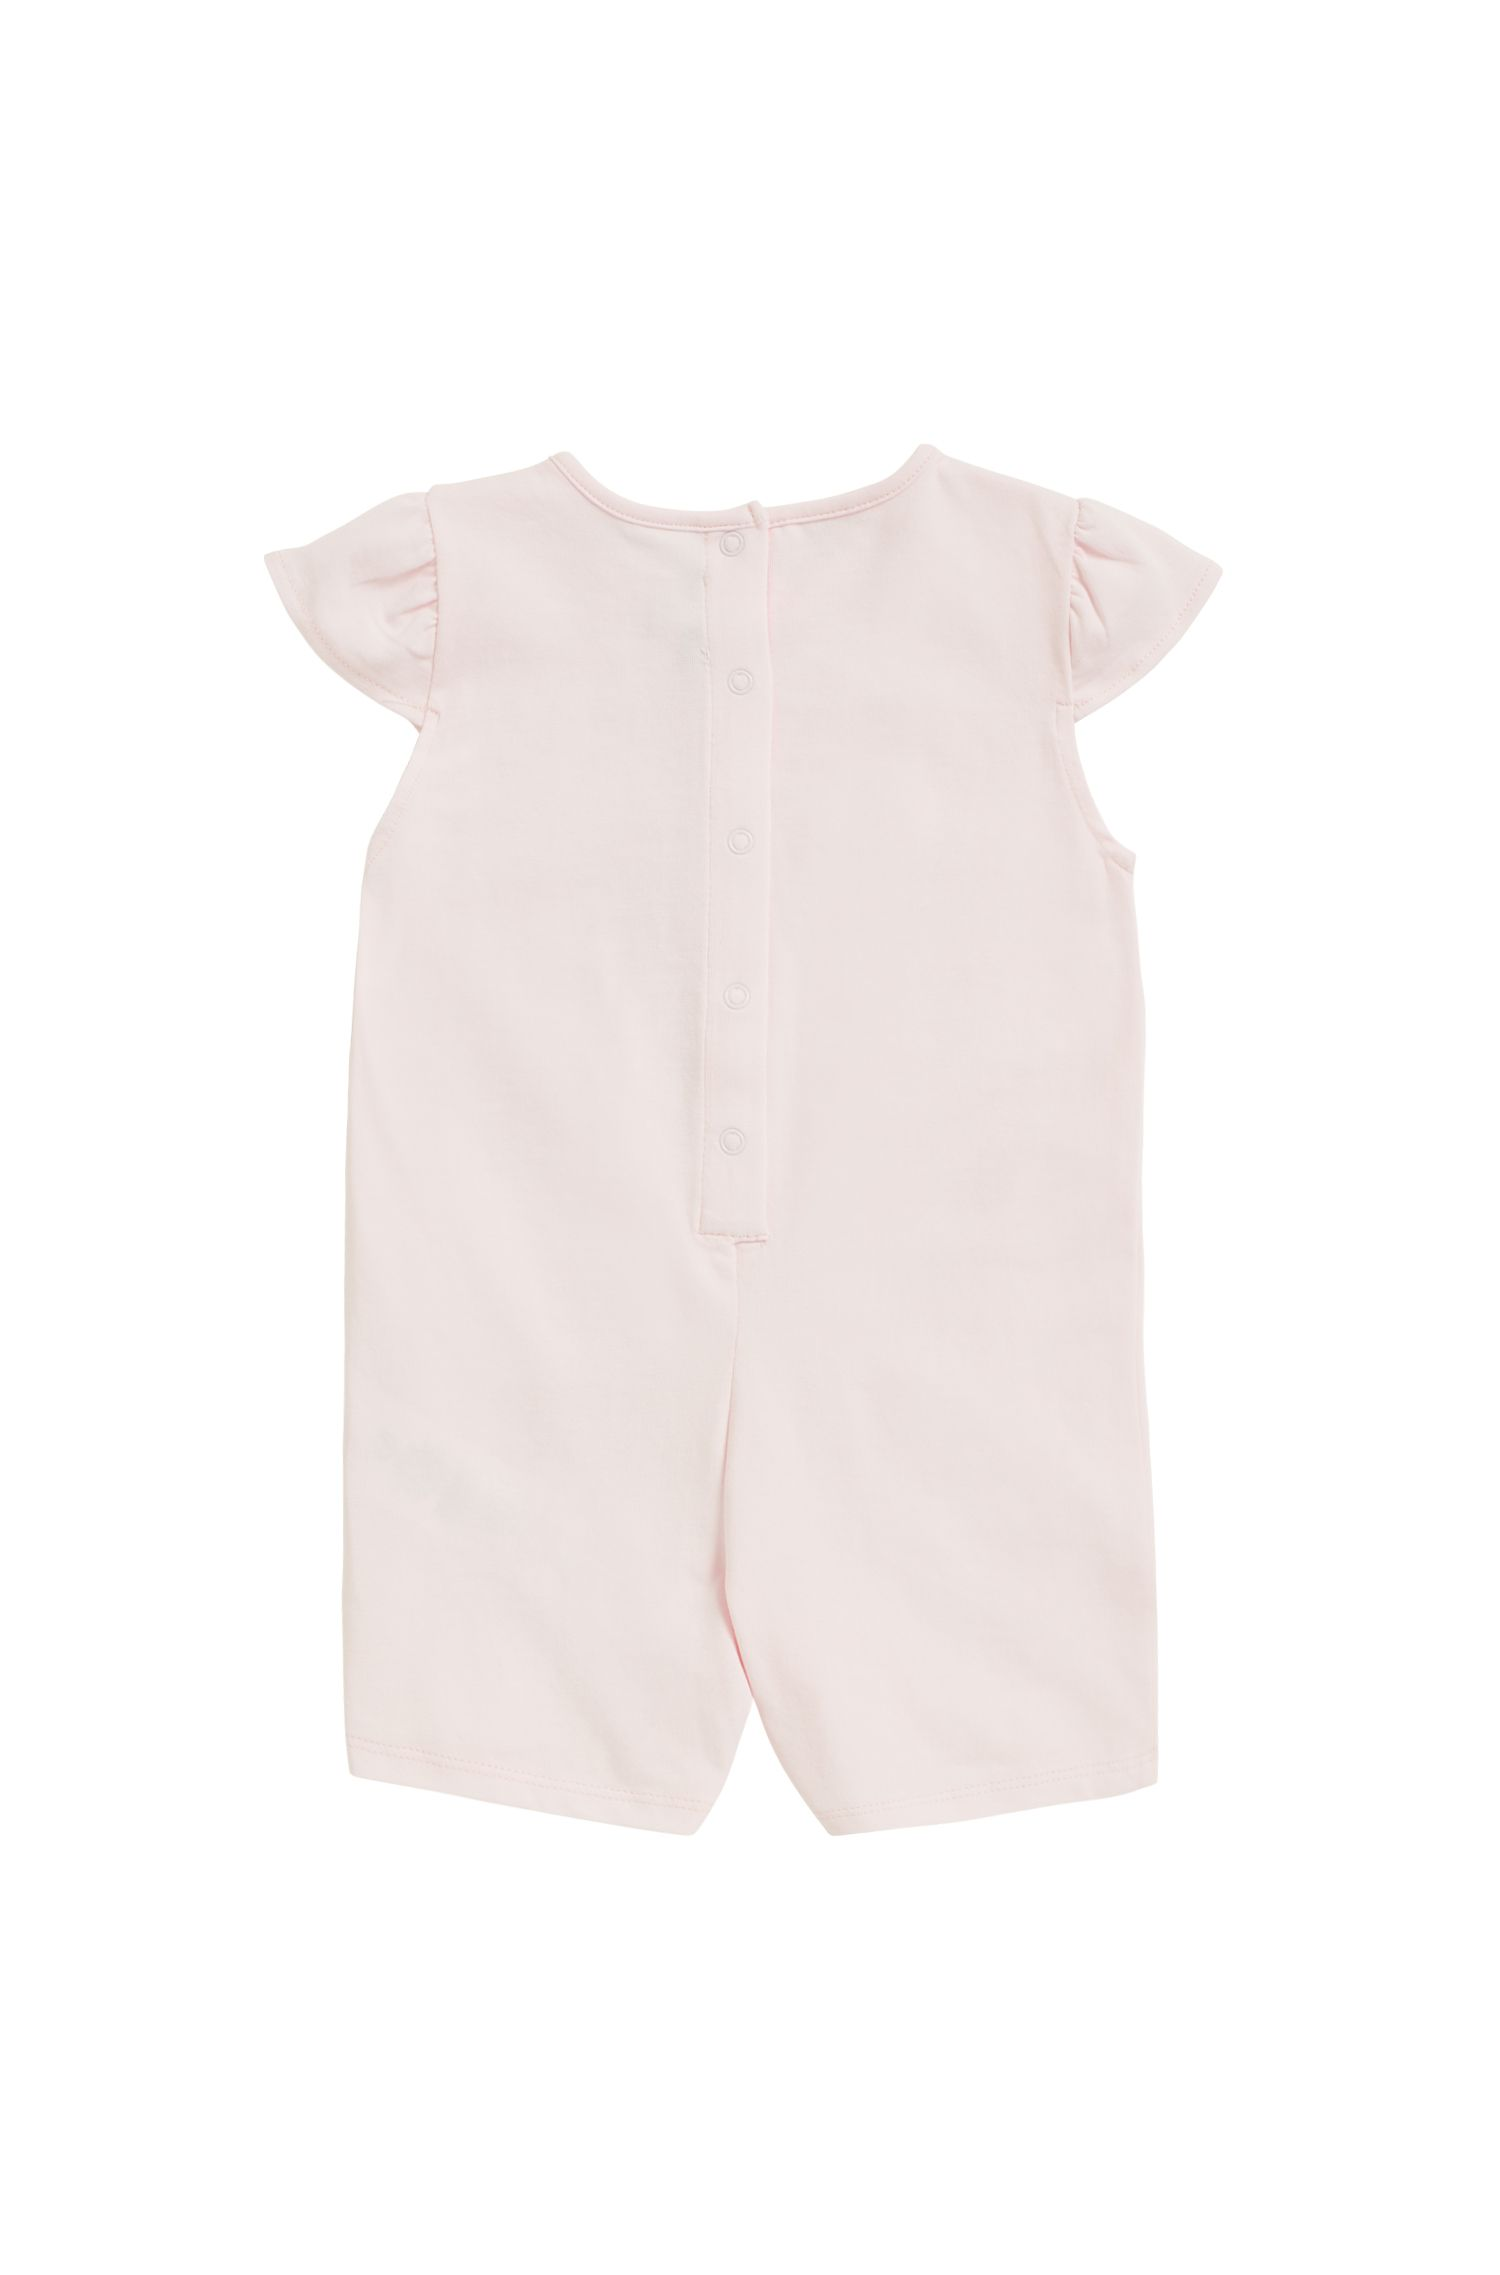 Baby-Jumpsuit aus elastischer Baumwolle in Schimmer-Optik